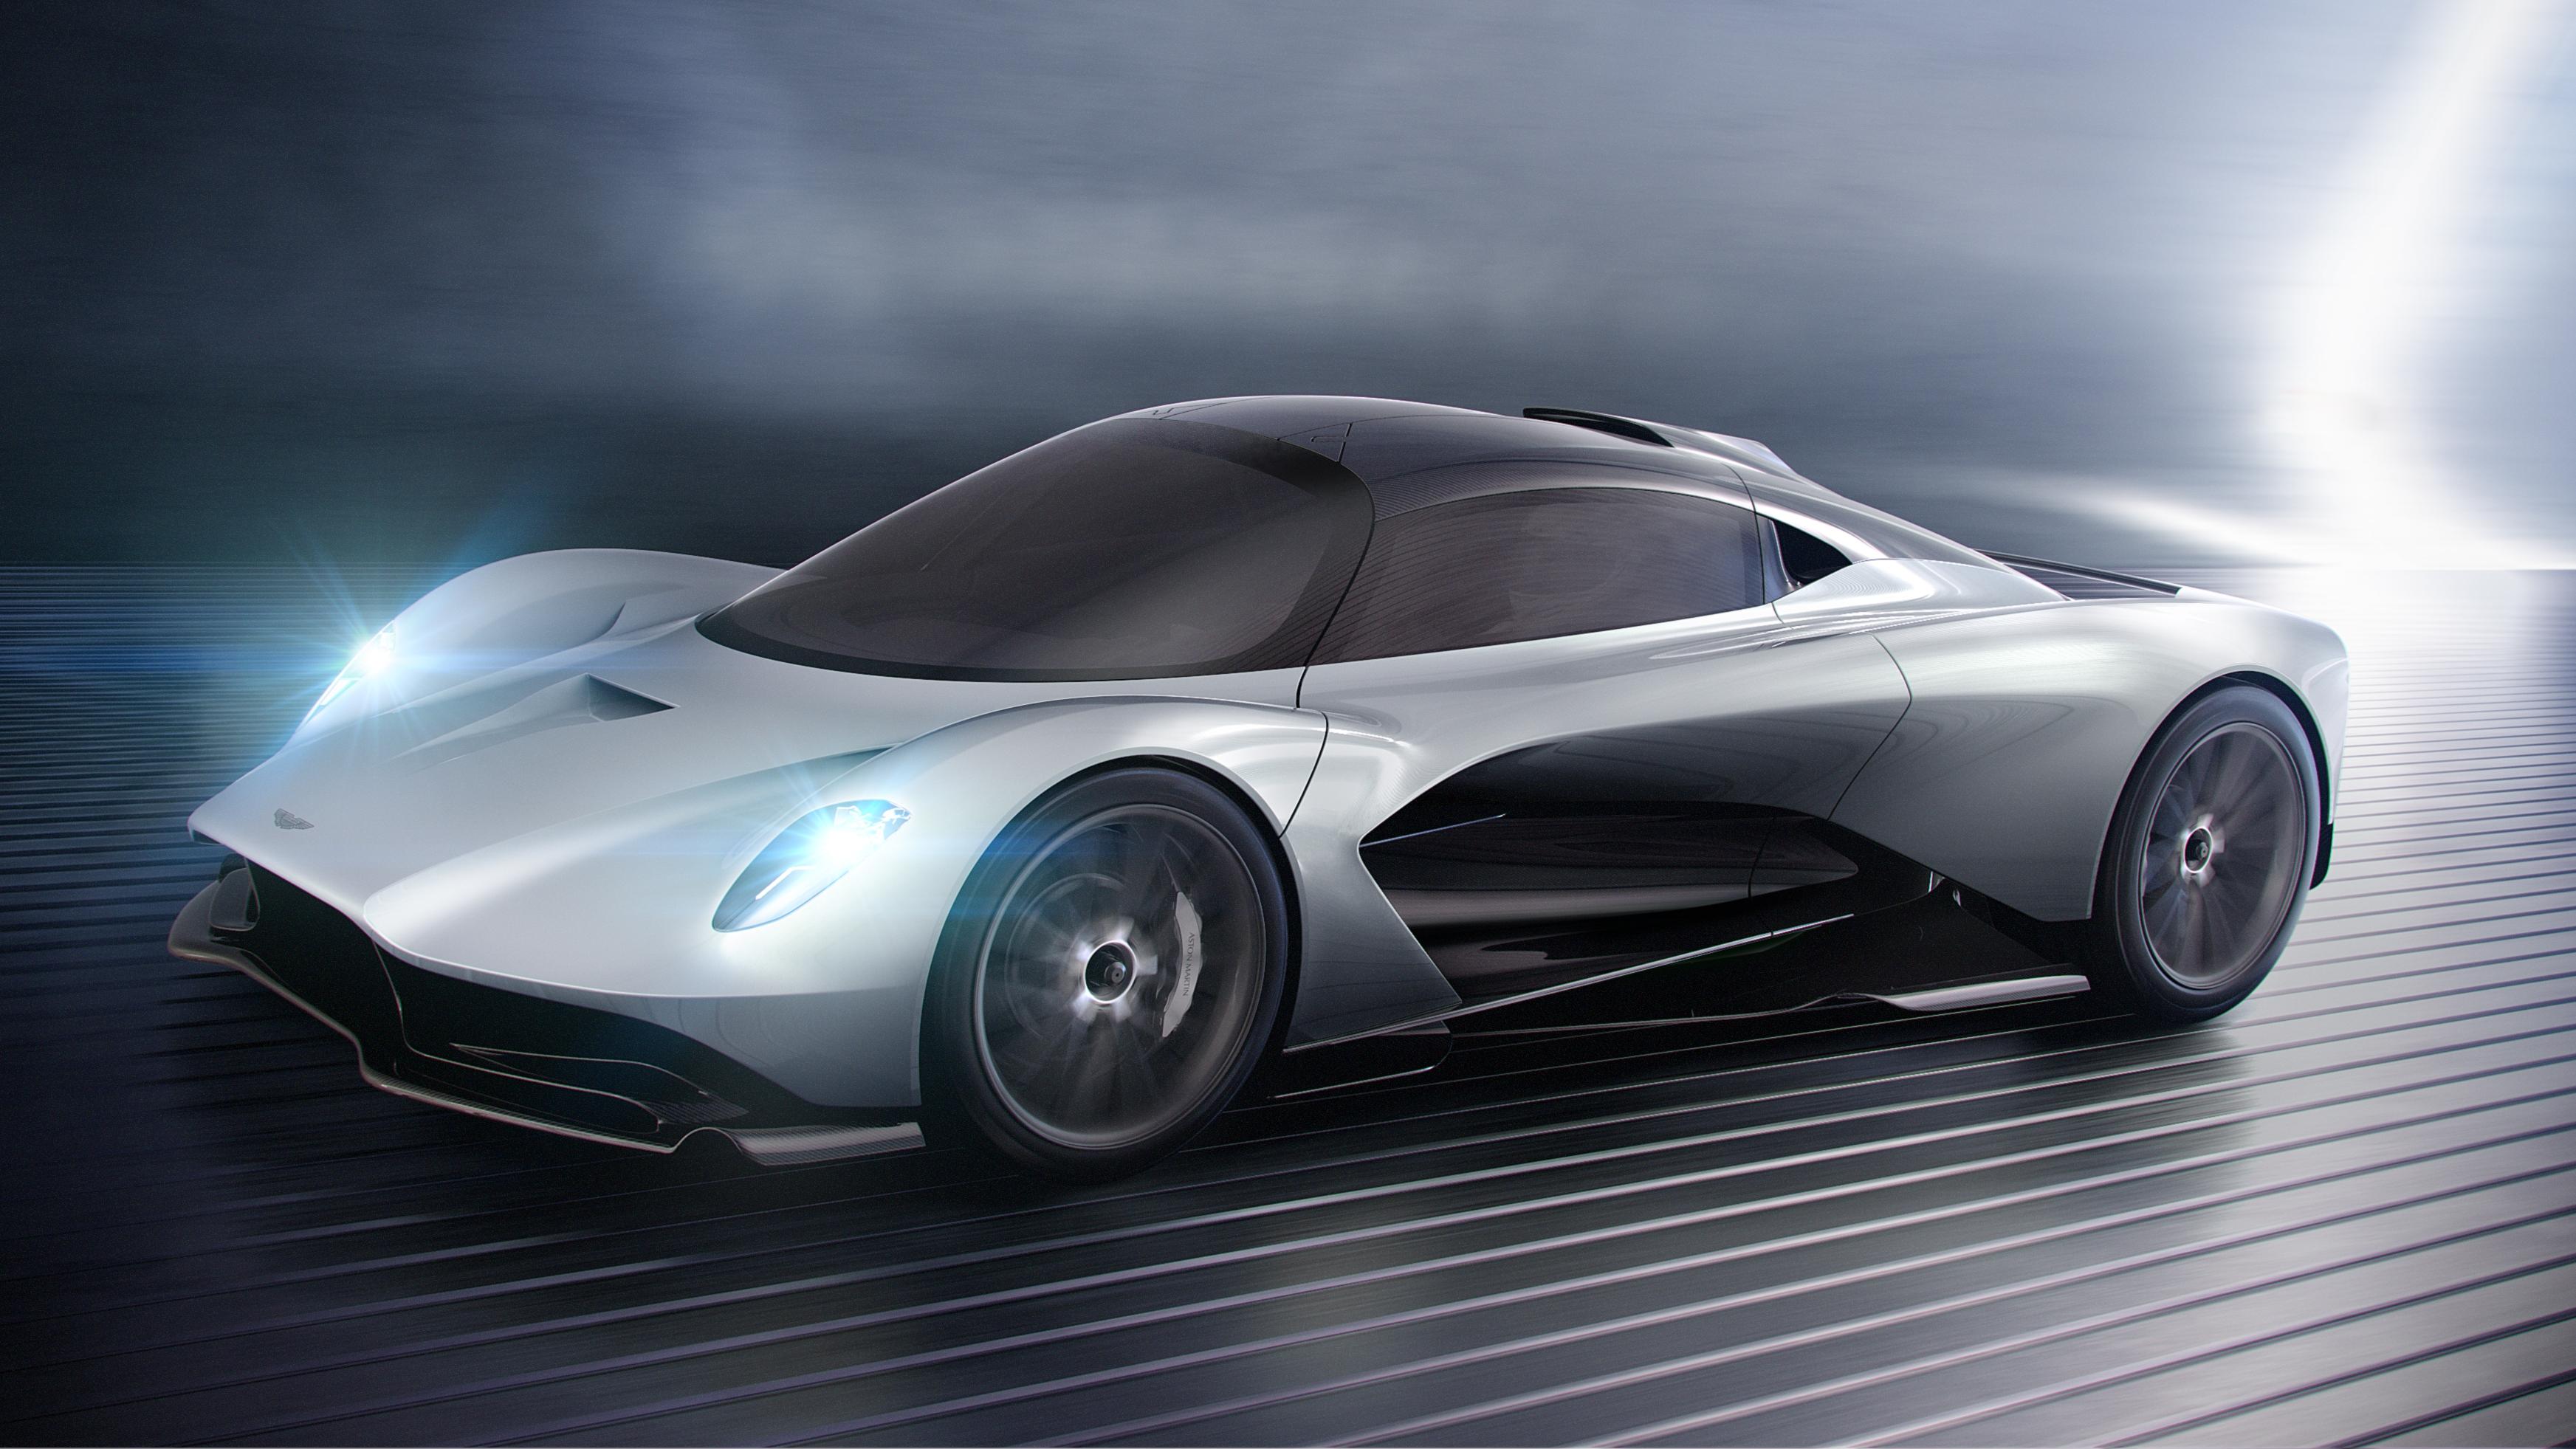 News - Aston Martin Vanquish Returns As Hybrid Supercar